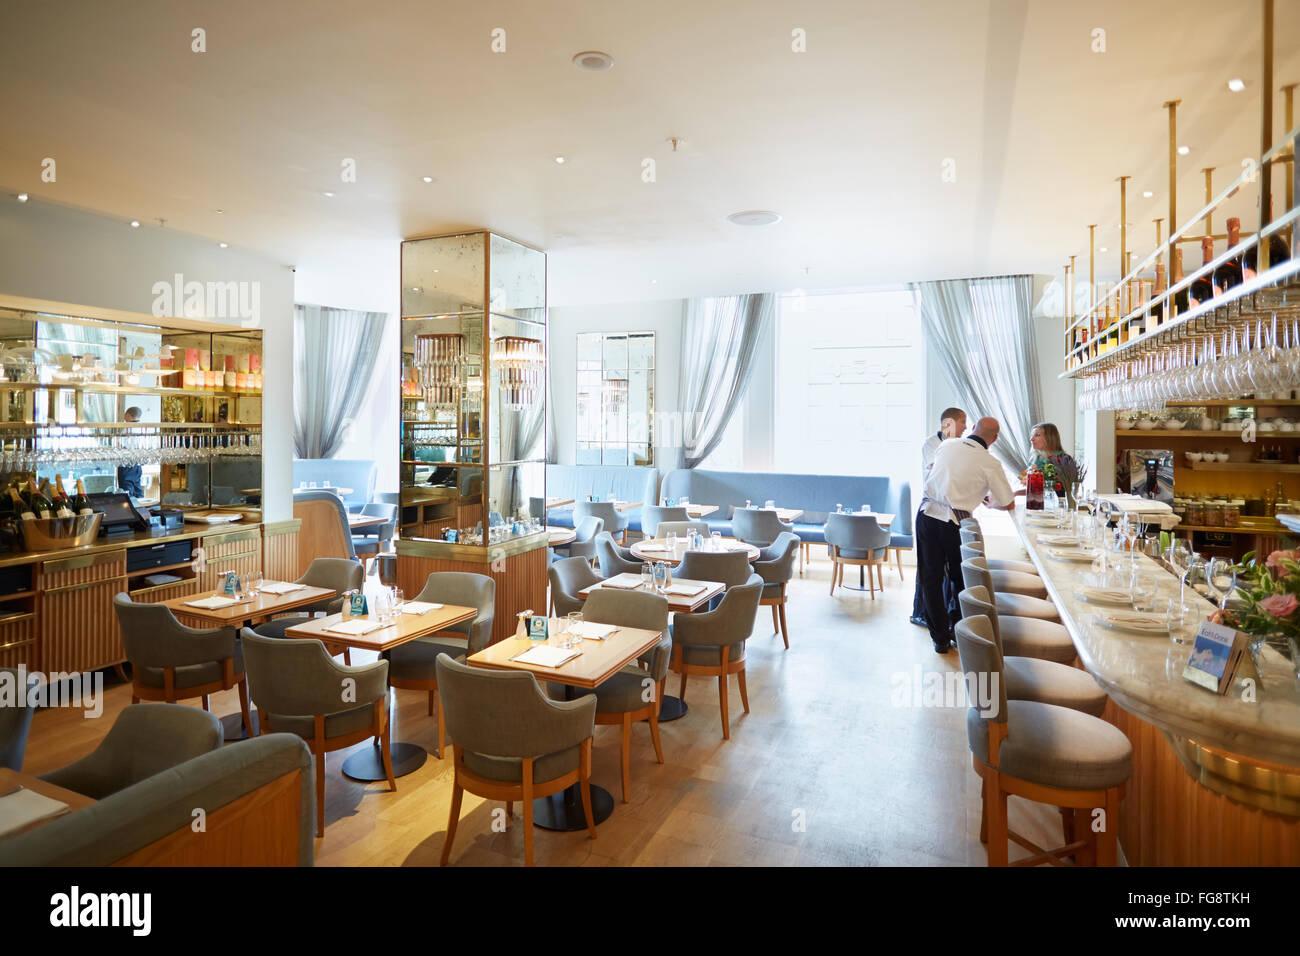 Selfridges department store interior, 'The Corner' restaurant in London - Stock Image